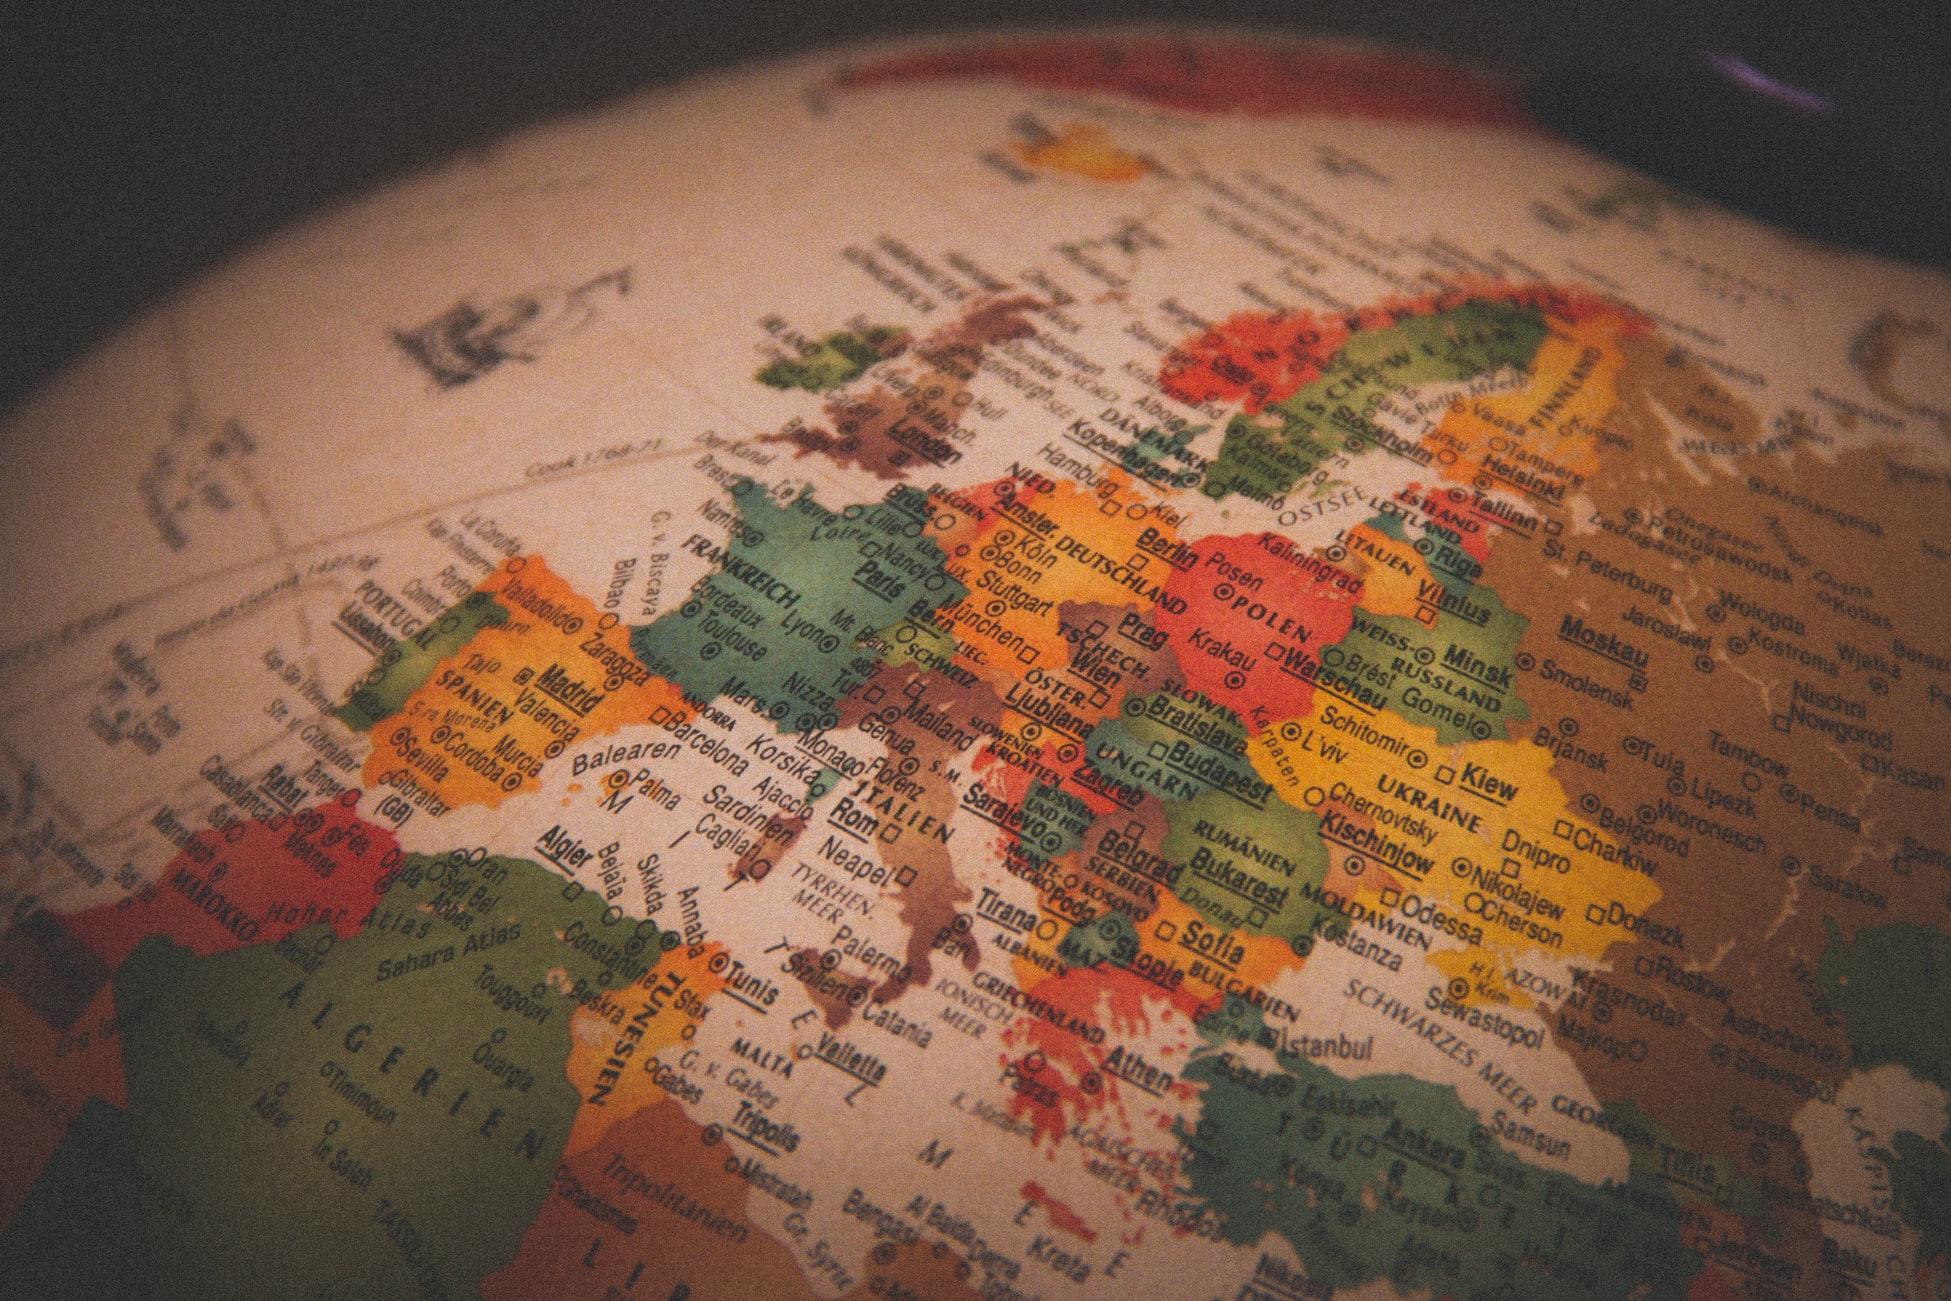 T&T Eco  - Envirofluid's Distribution Partner across EMEA